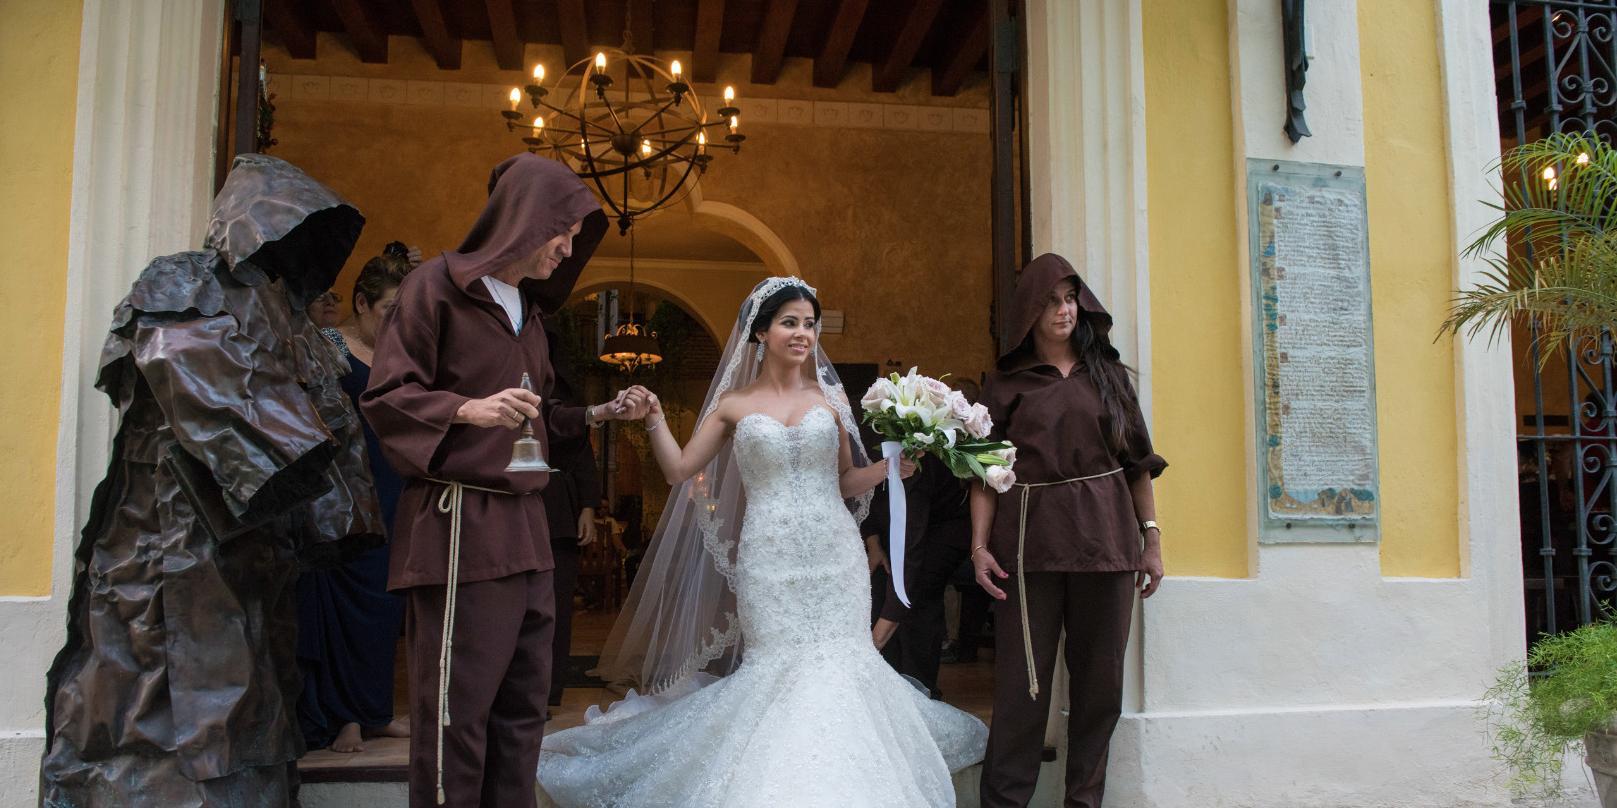 bodas-estilo-clasico-sin-tema-cuba-16521.jpg